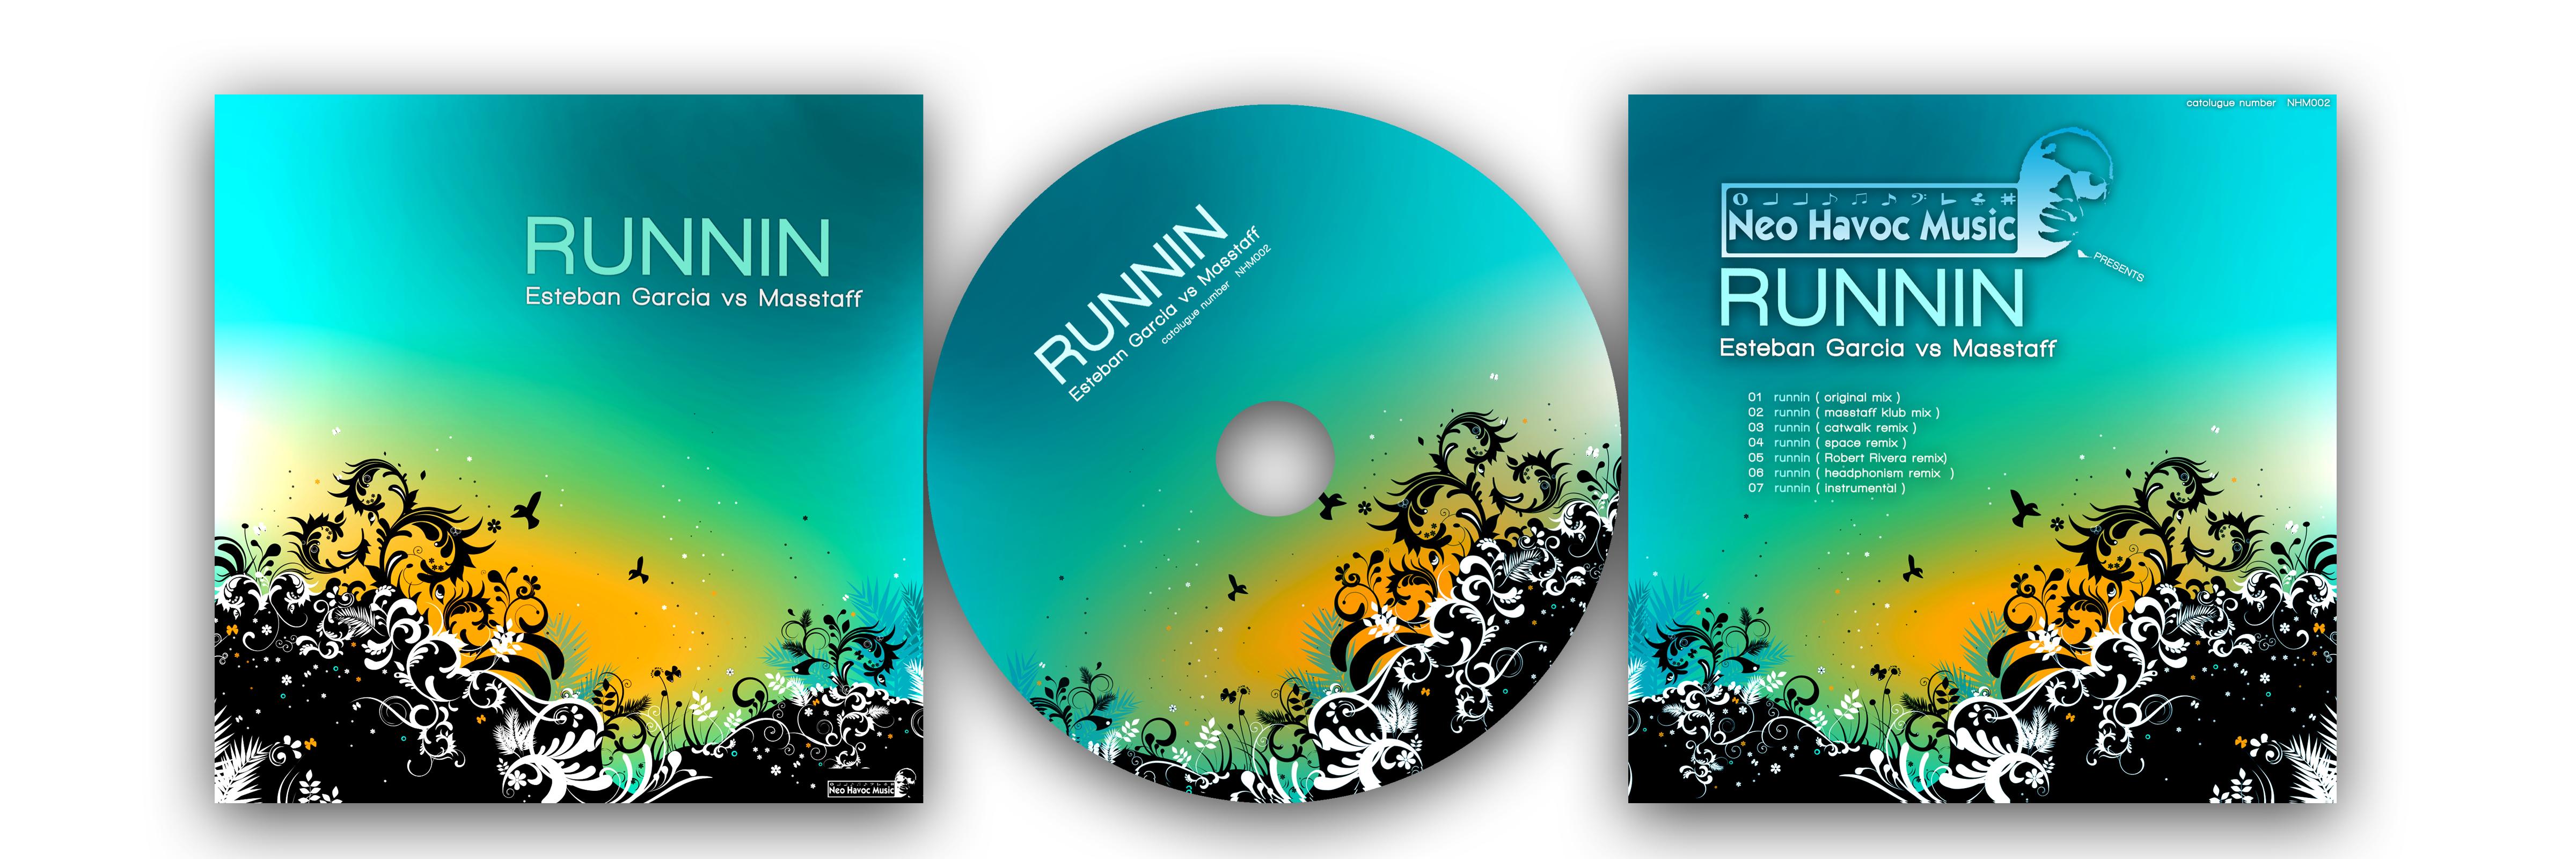 Cd cover design by Pixartbelgium on DeviantArt